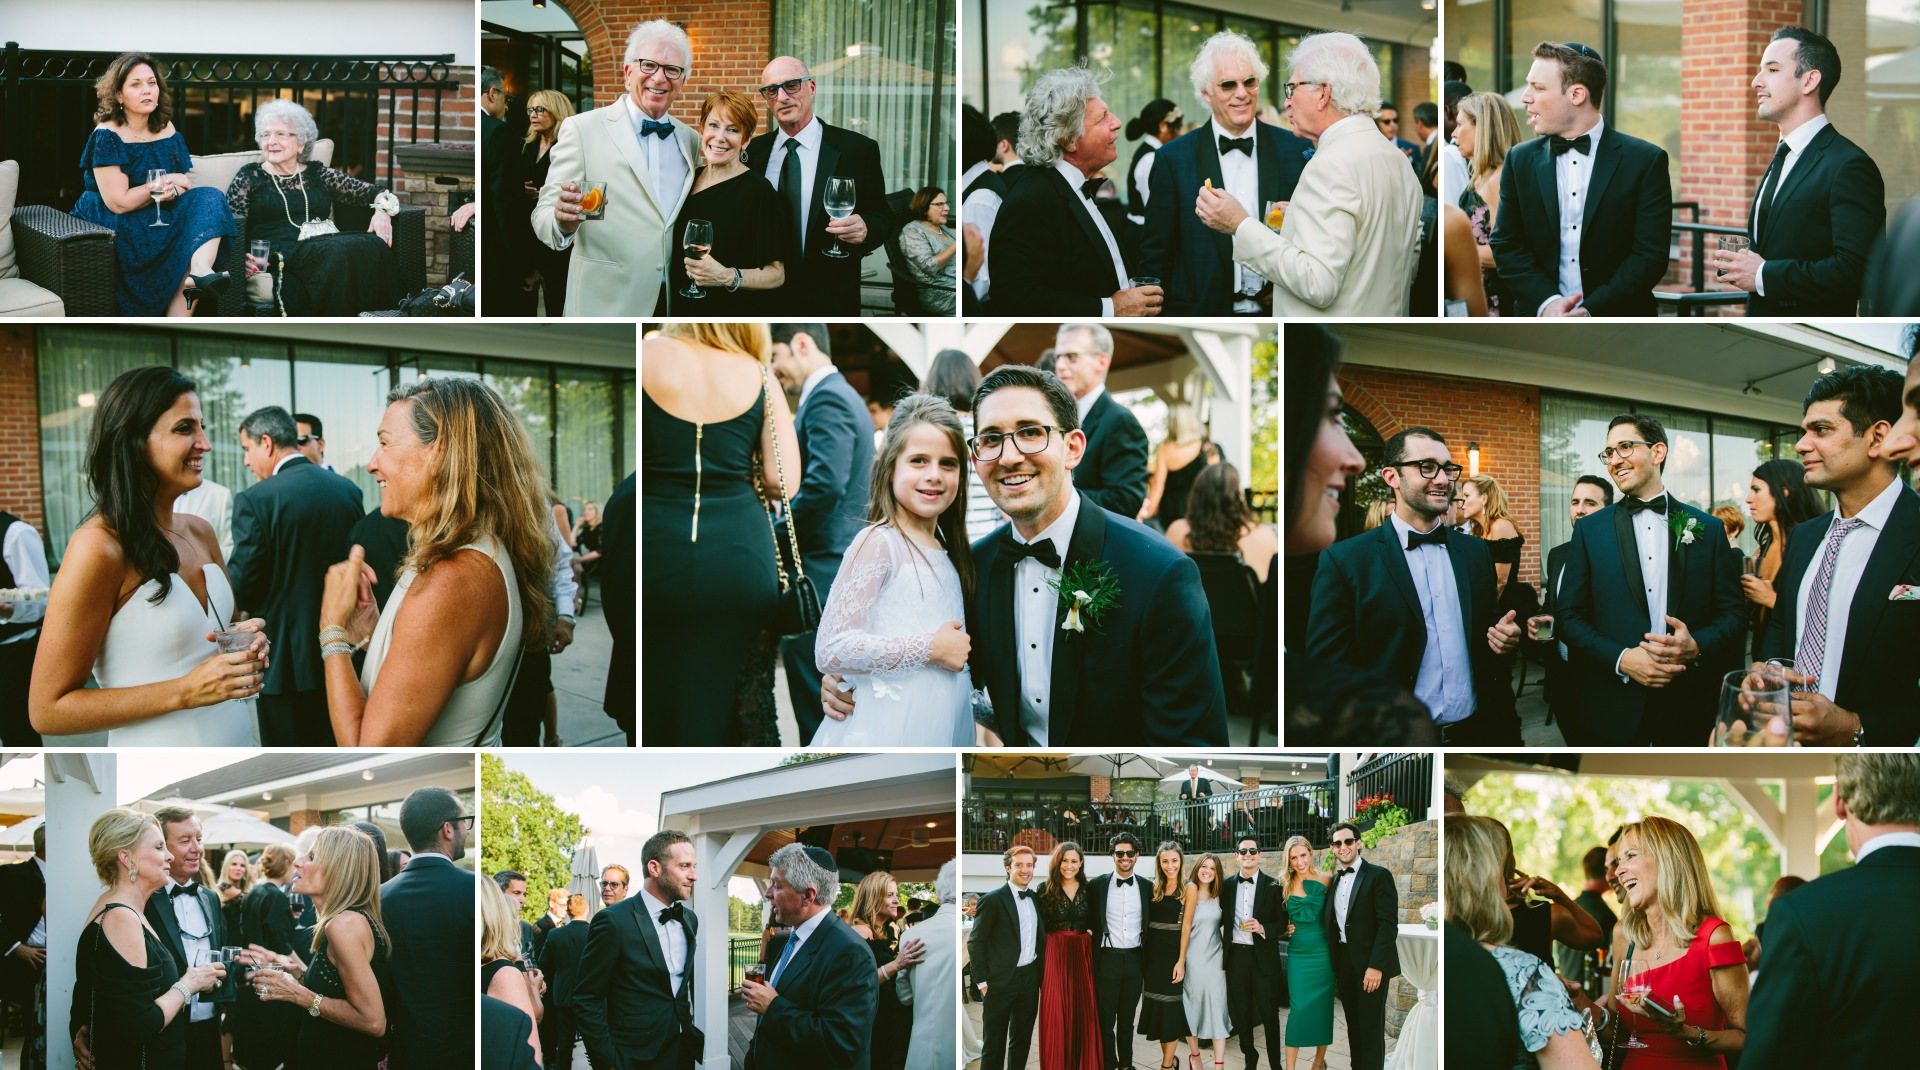 Beechmont Country Club Wedding Photographer in Beachwood 2 42.jpg